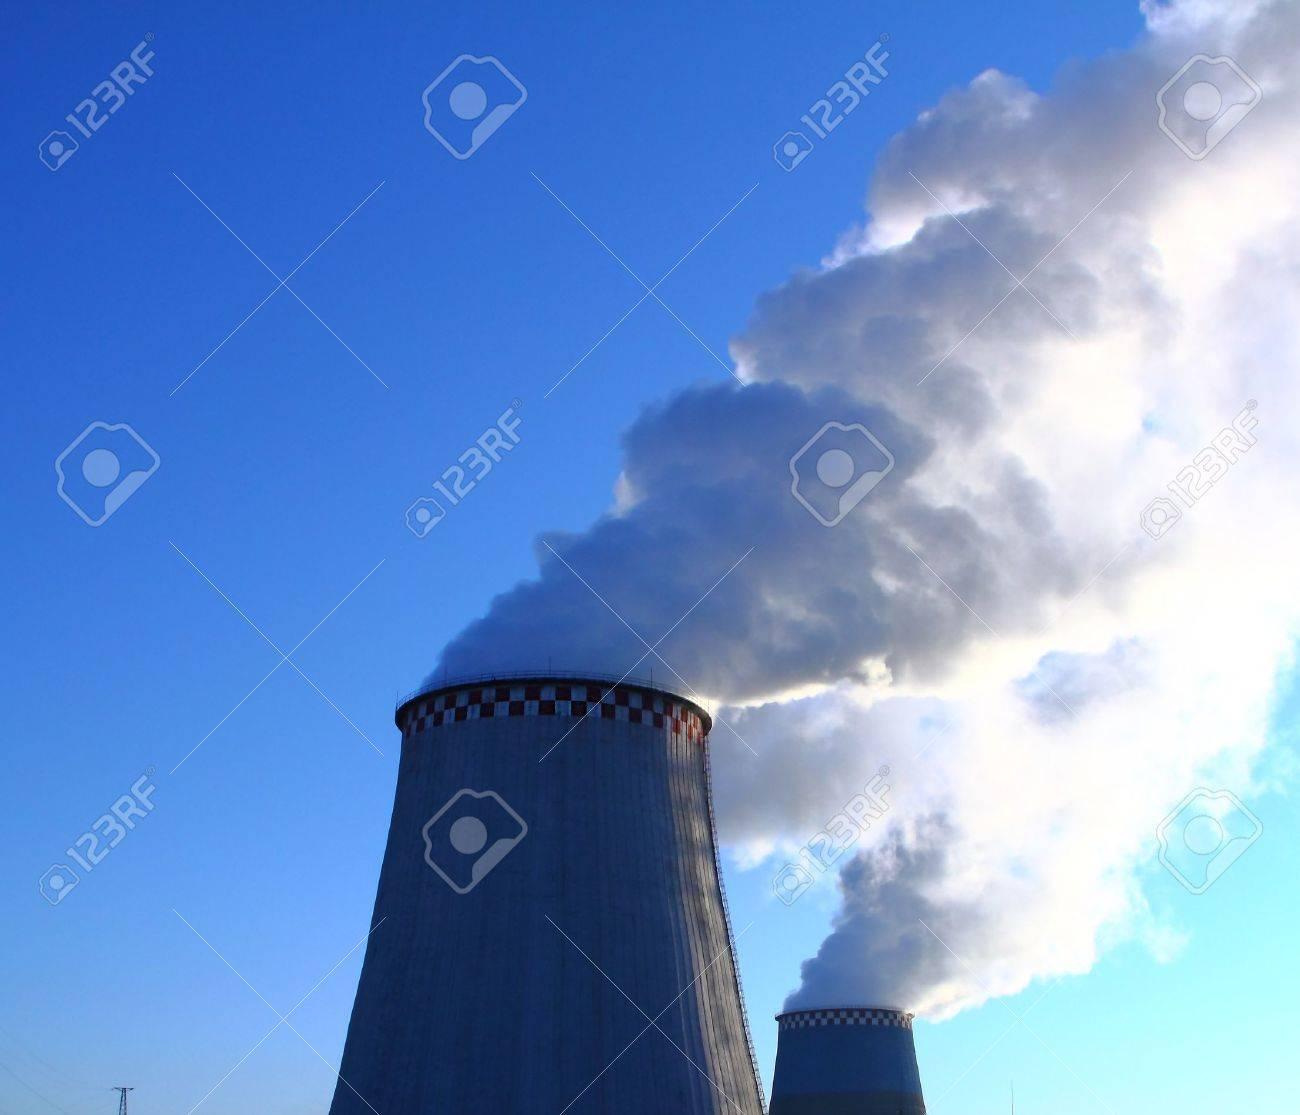 Smoking chimneys. Heat Electric Station. - 10739886